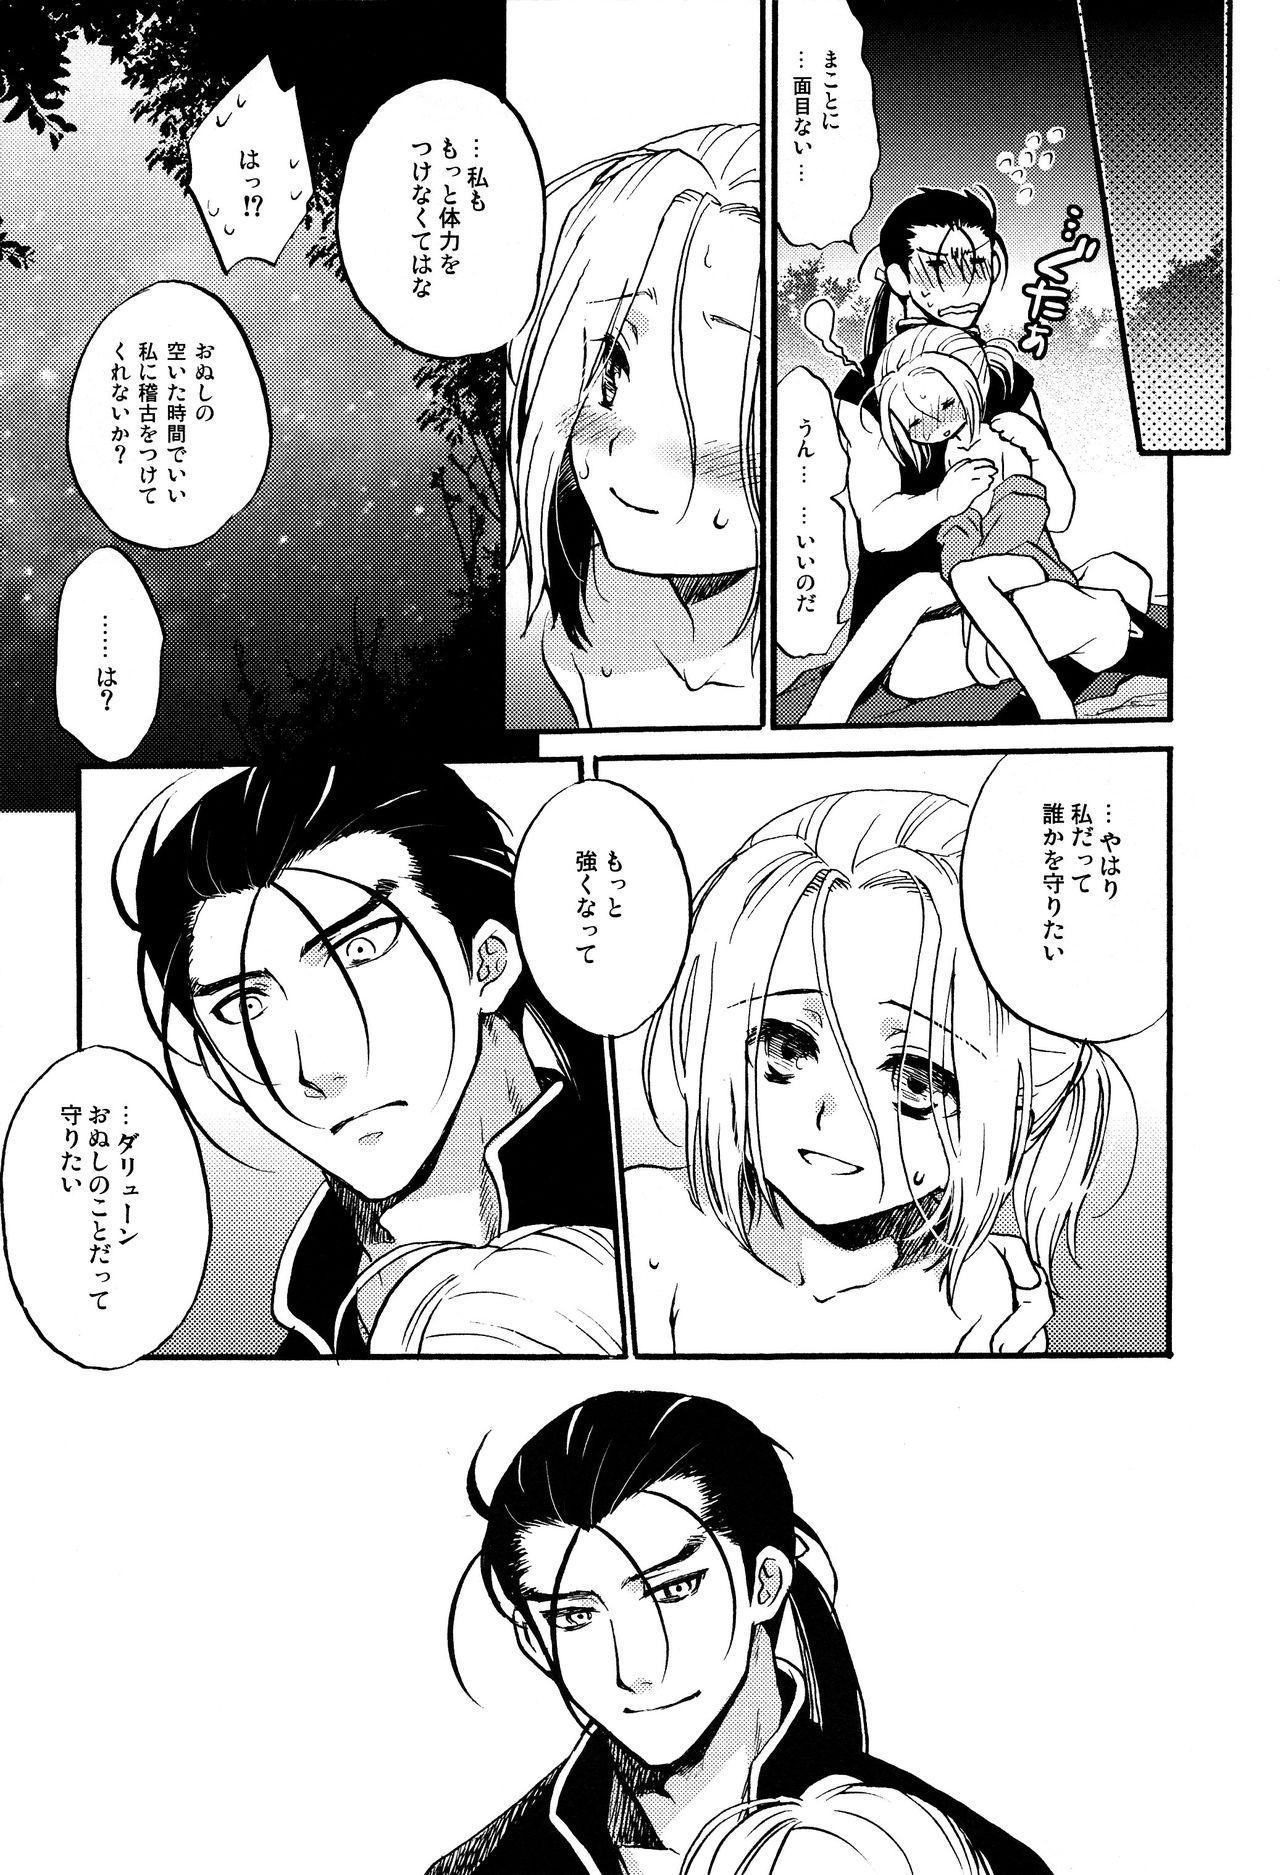 Denka no Gohoubi! 16